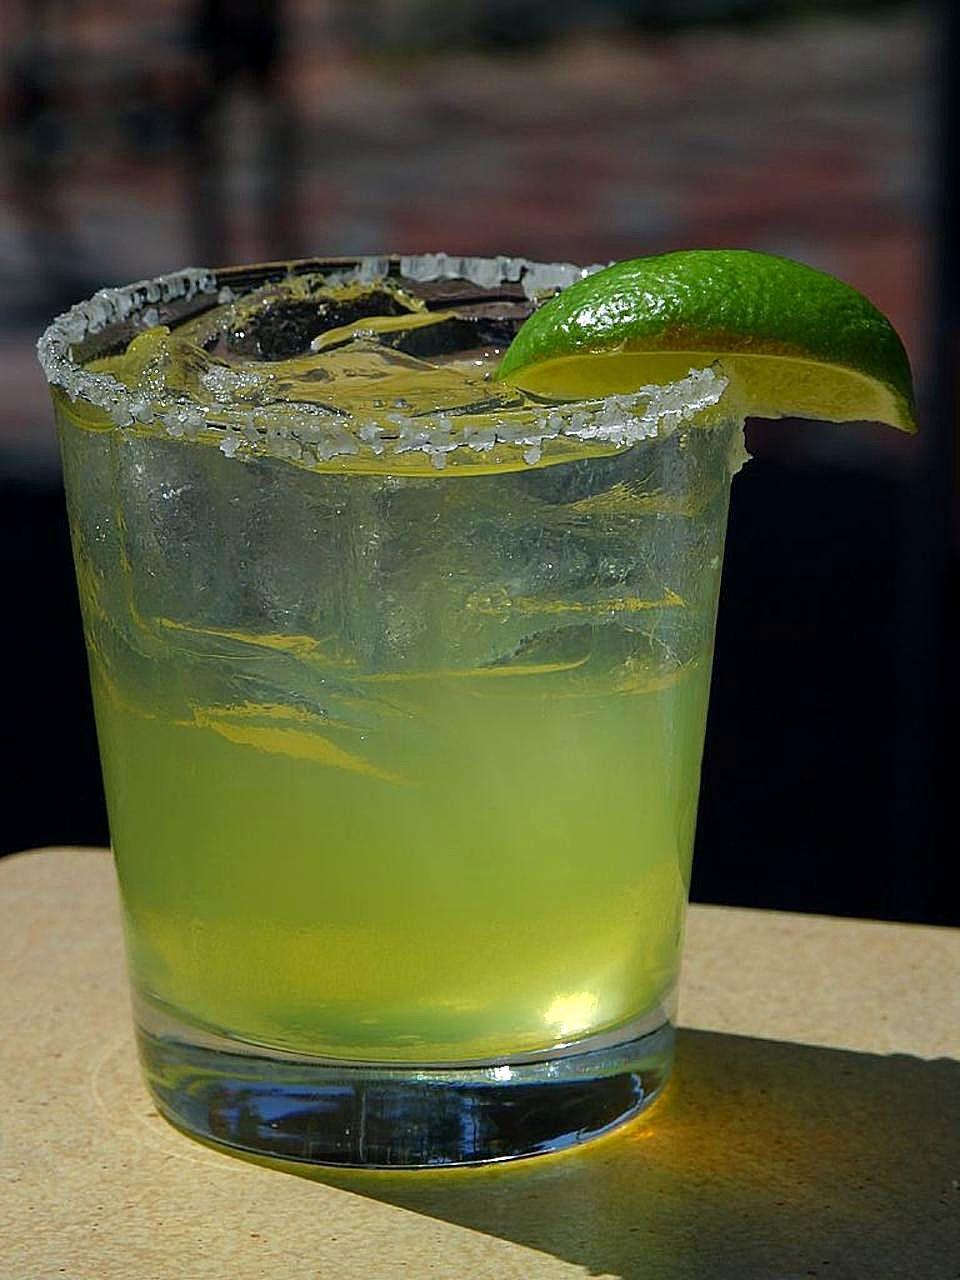 free picture margaritas green drinks ice cocktails. Black Bedroom Furniture Sets. Home Design Ideas